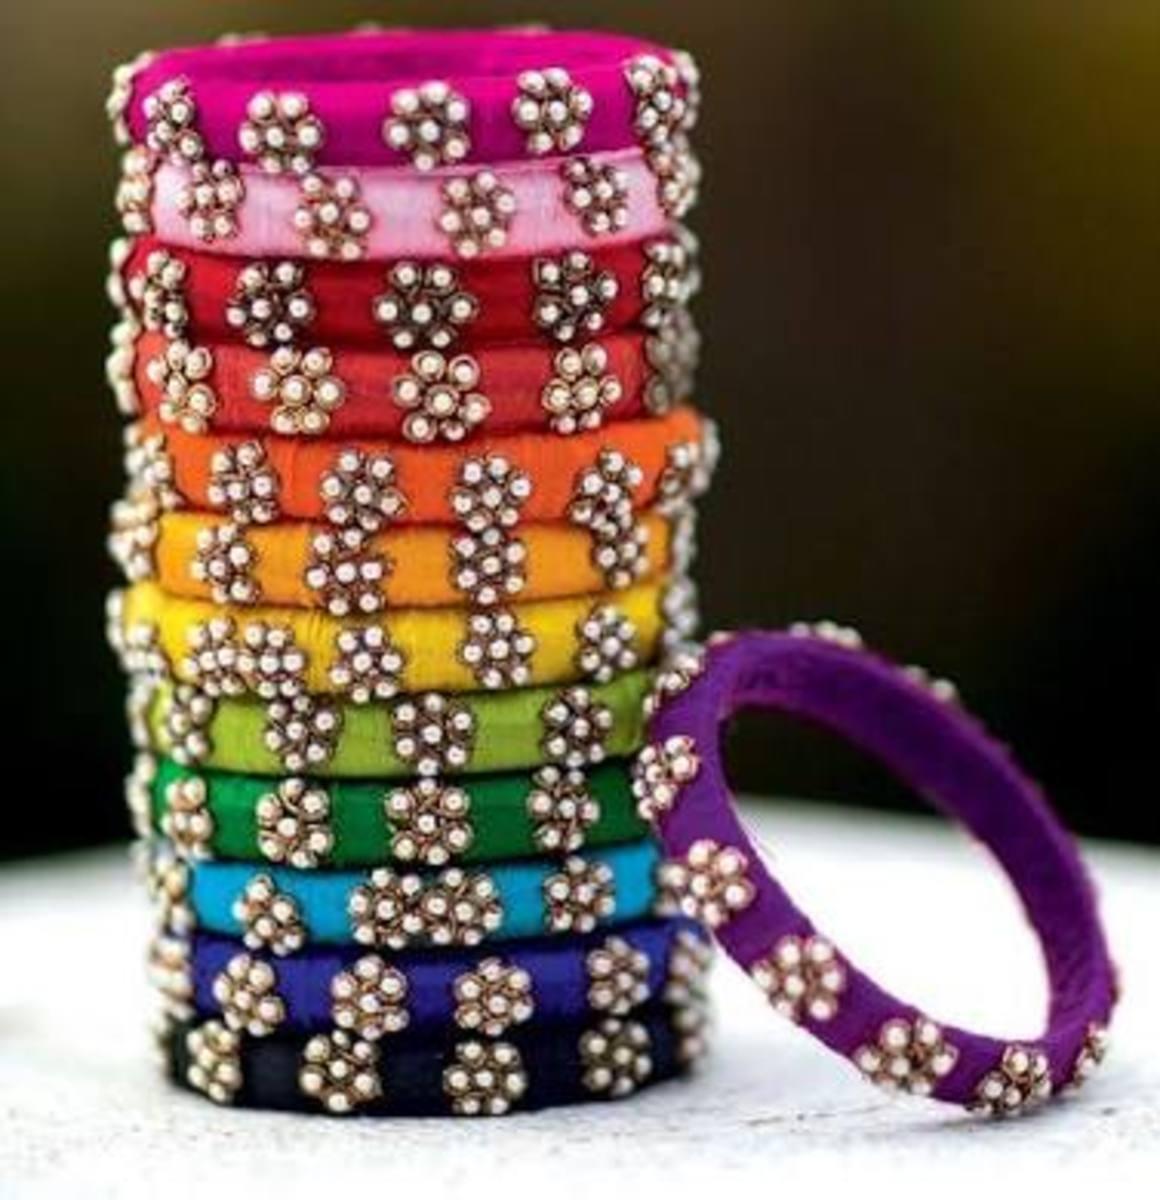 Colourful glass bangles